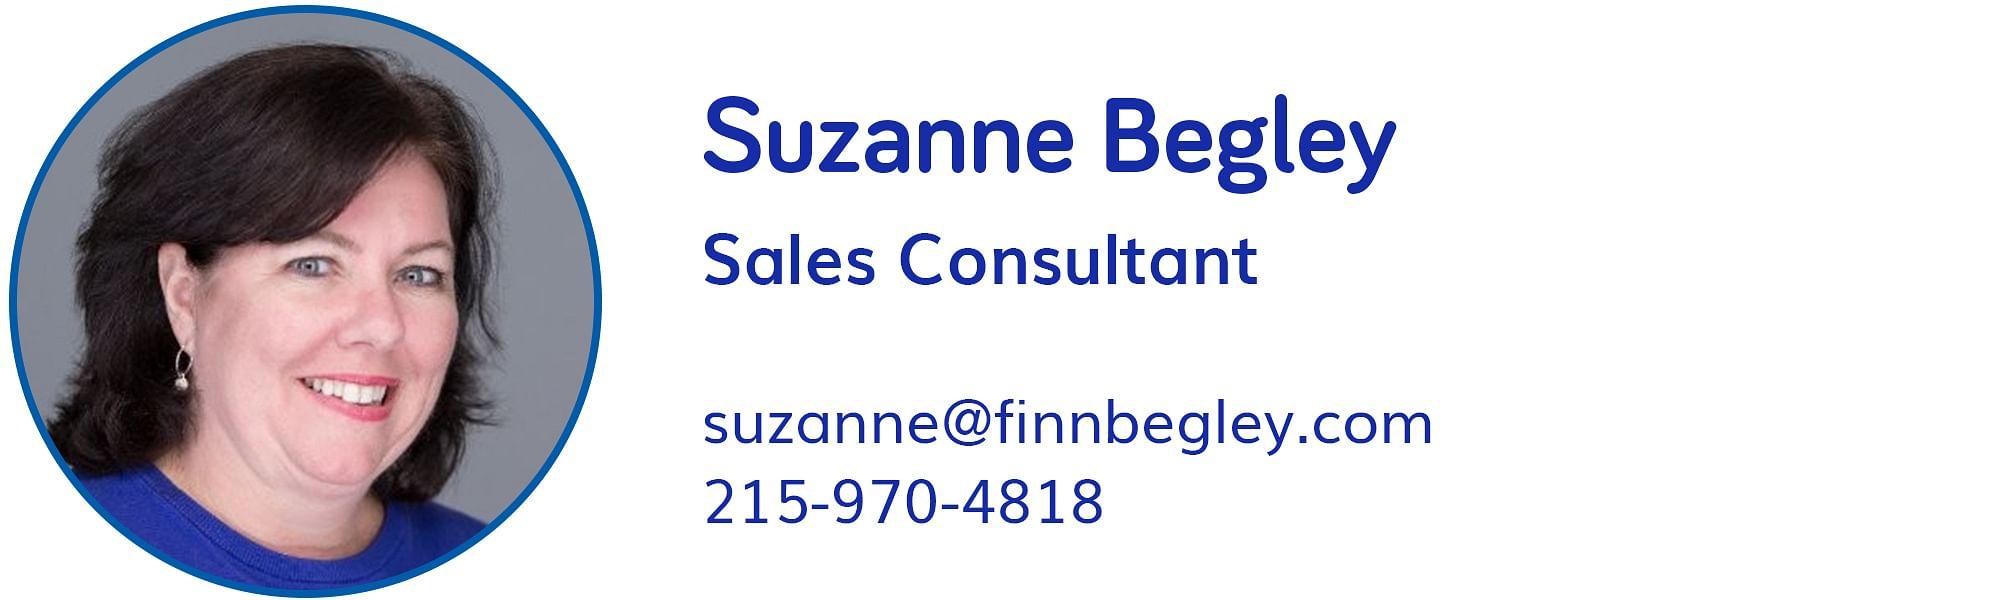 Suzanne Begley, suzanne@finnbegley.com, 215-970-4818